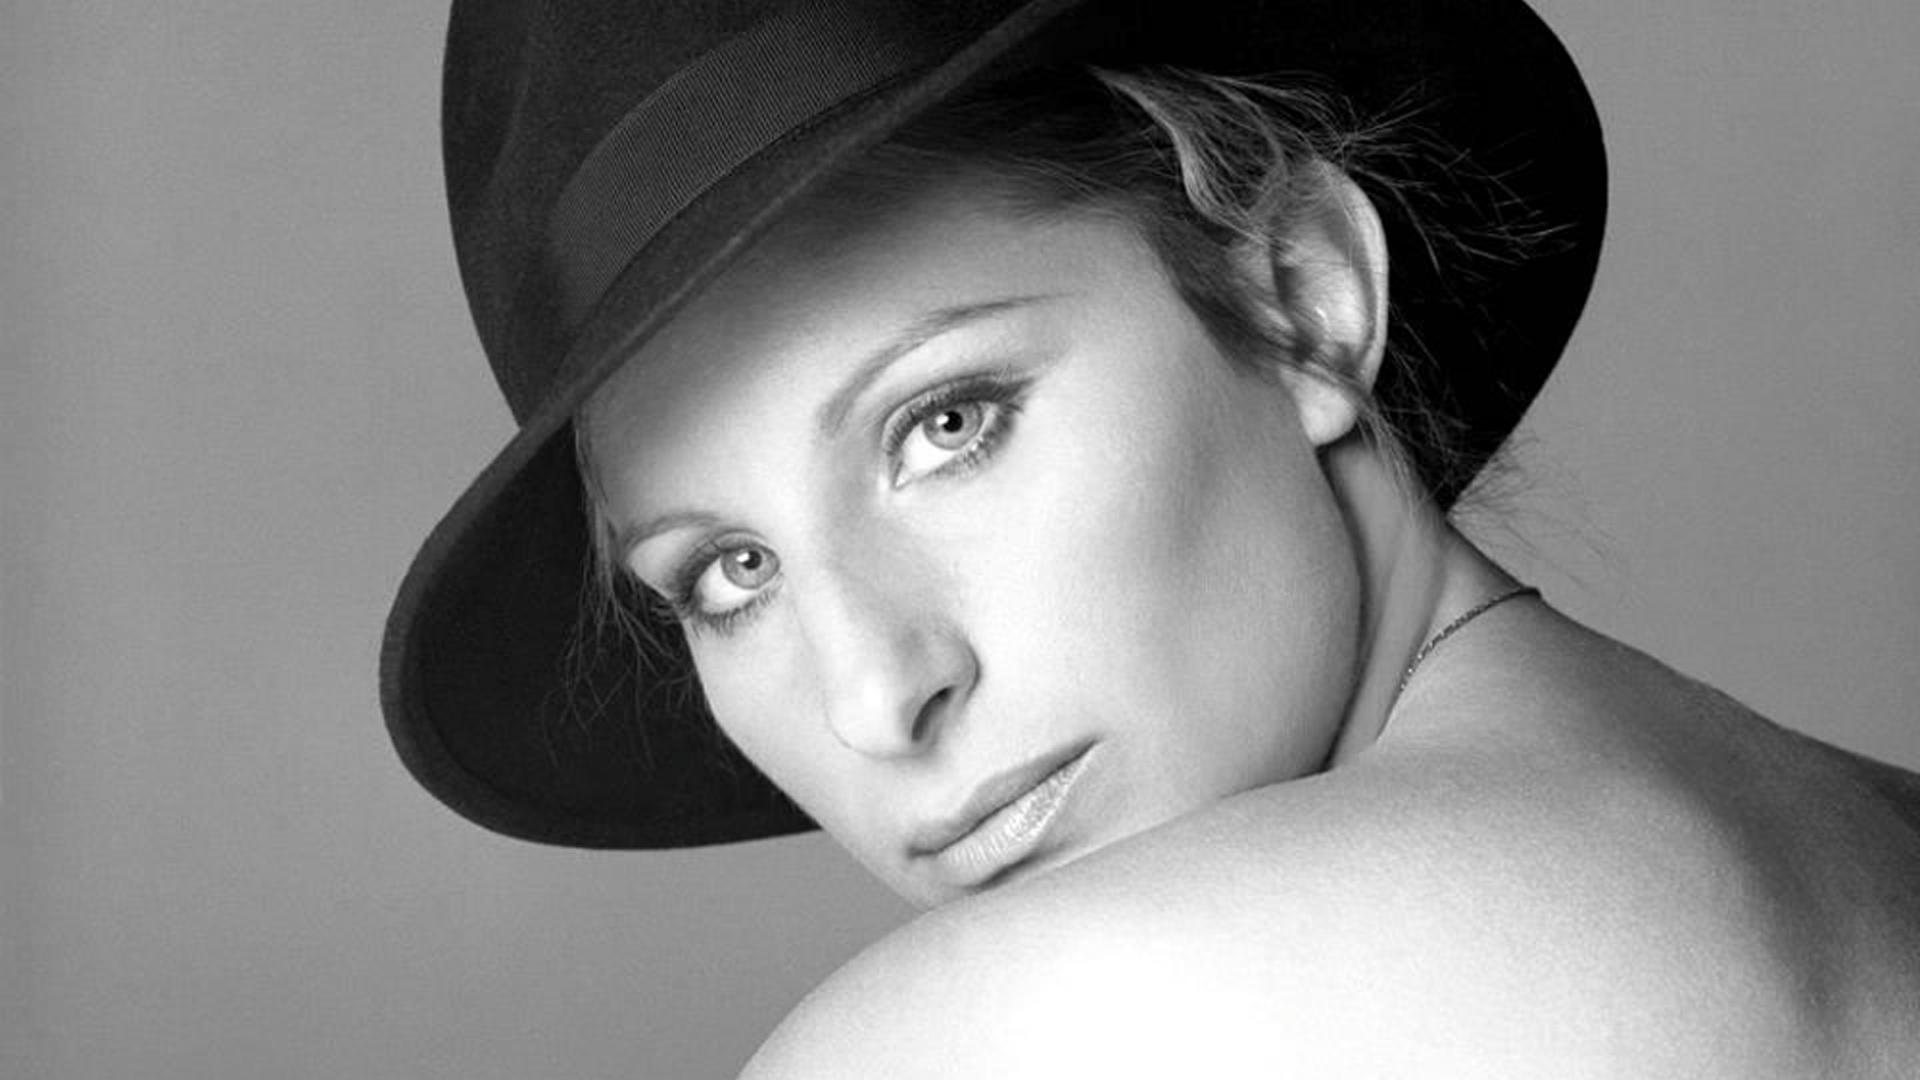 Barbra Streisand High Quality Wallpapers